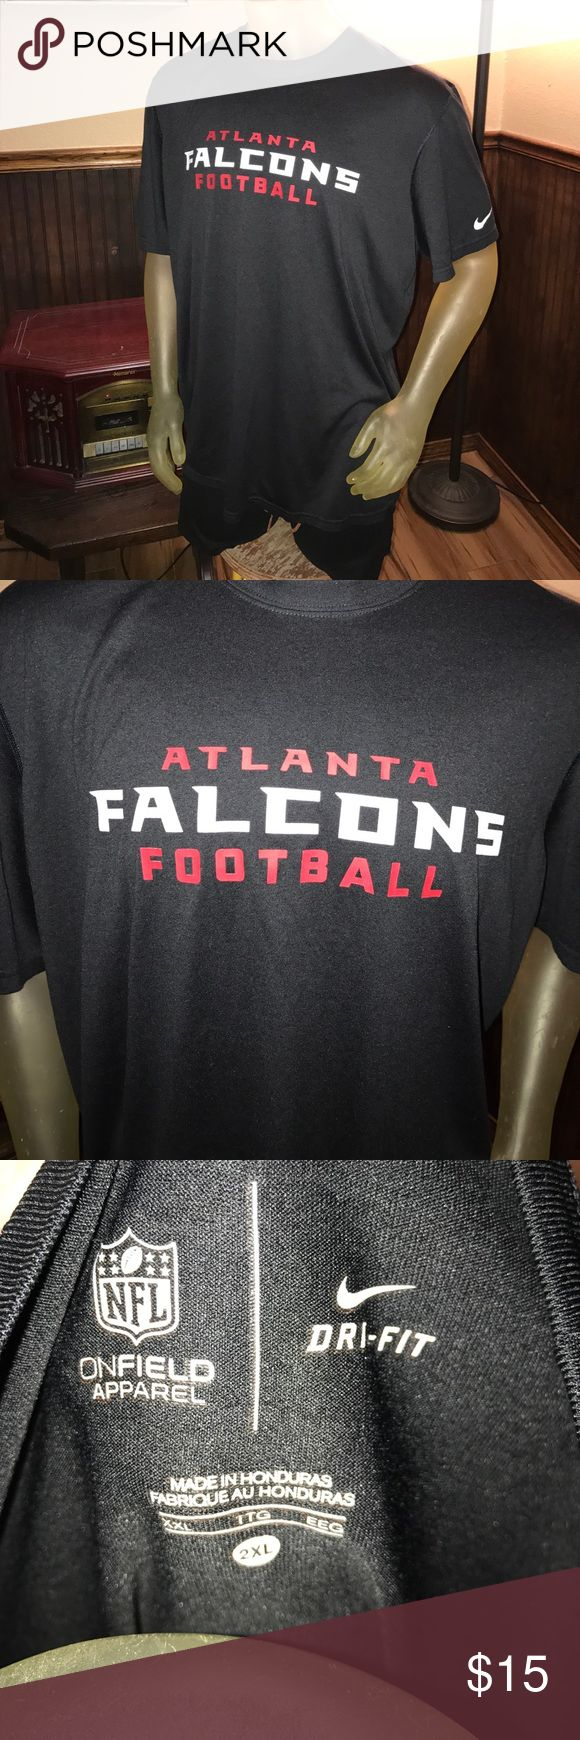 "NFL Nike Atlanta Falcons Football 🏈 Dri-Fit 2XL NFL Nike Atlanta Falcons Football 🏈 Dri-Fit 2XL 28"" Pit to Pit / 30.5"" Length Nike Shirts Tees - Short Sleeve"